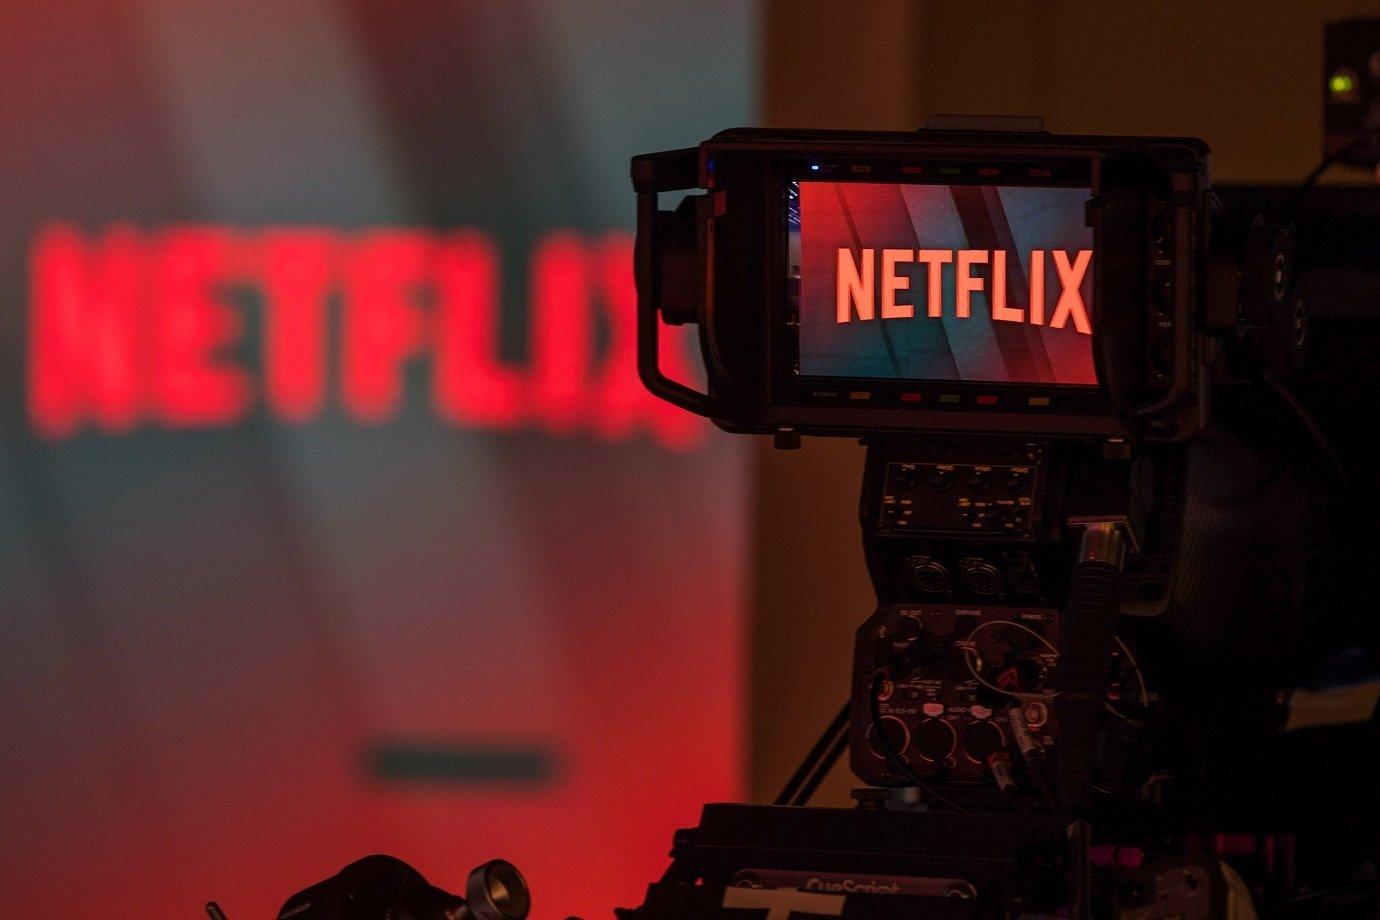 Netflix camera